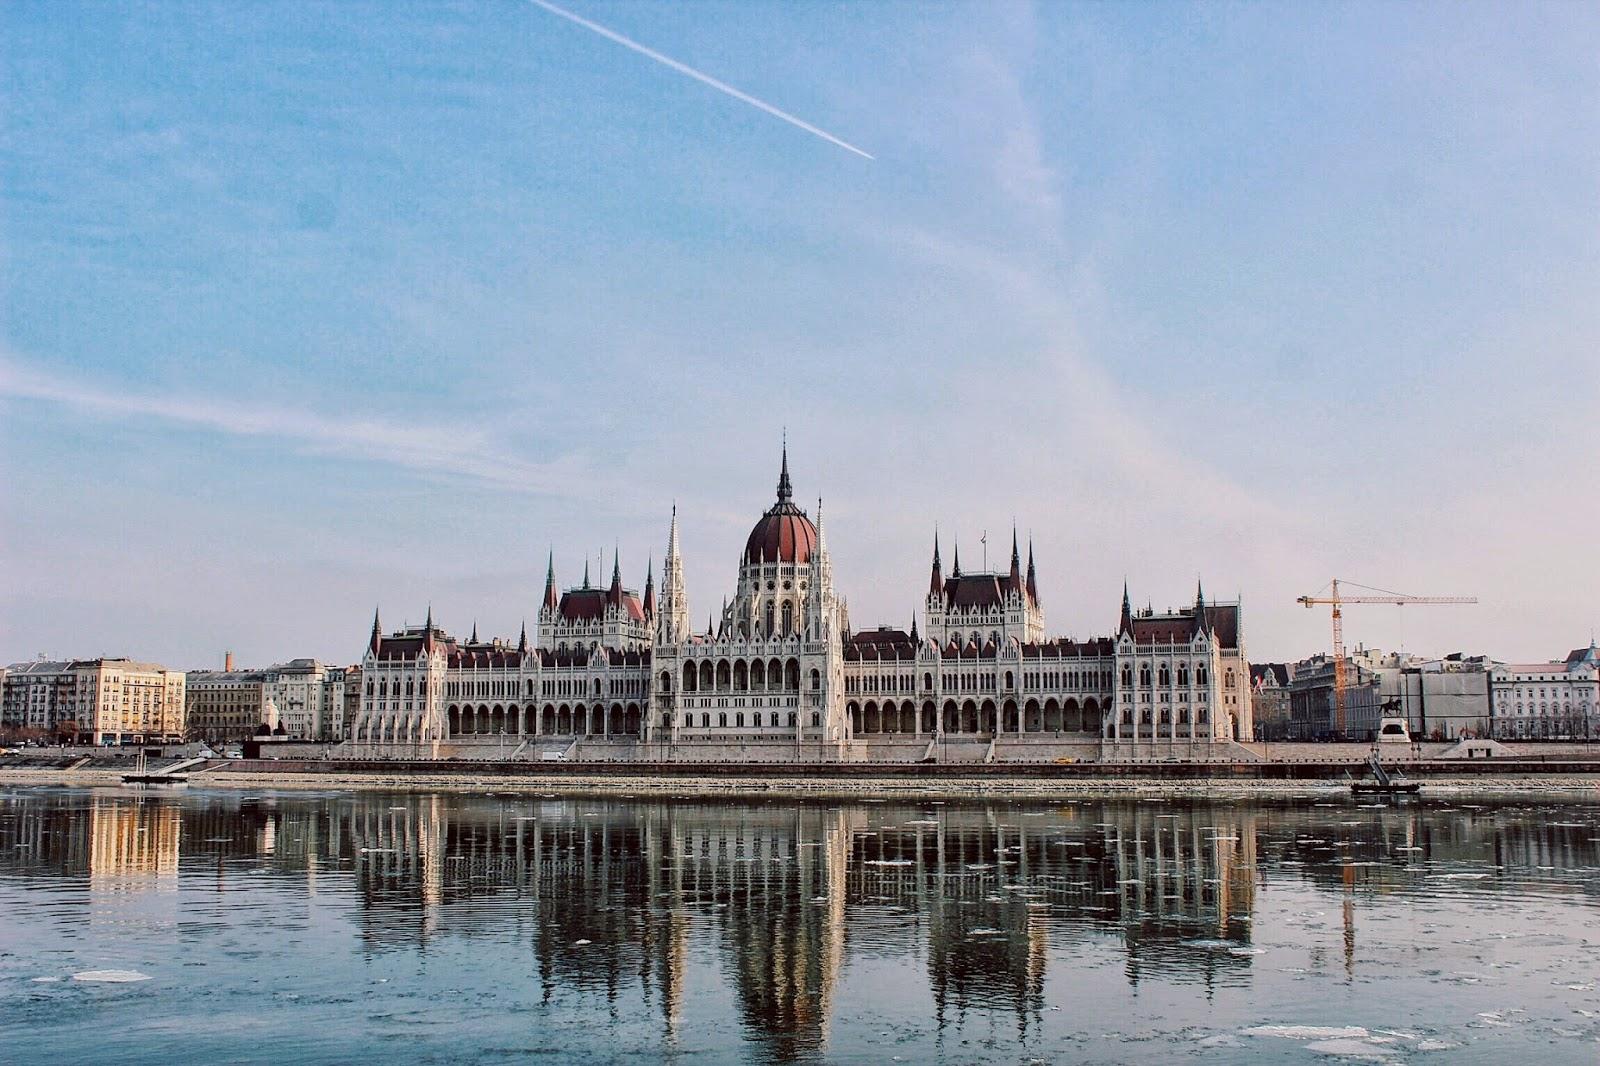 lifesthayle-budapest-hungarian-parliament.jpg